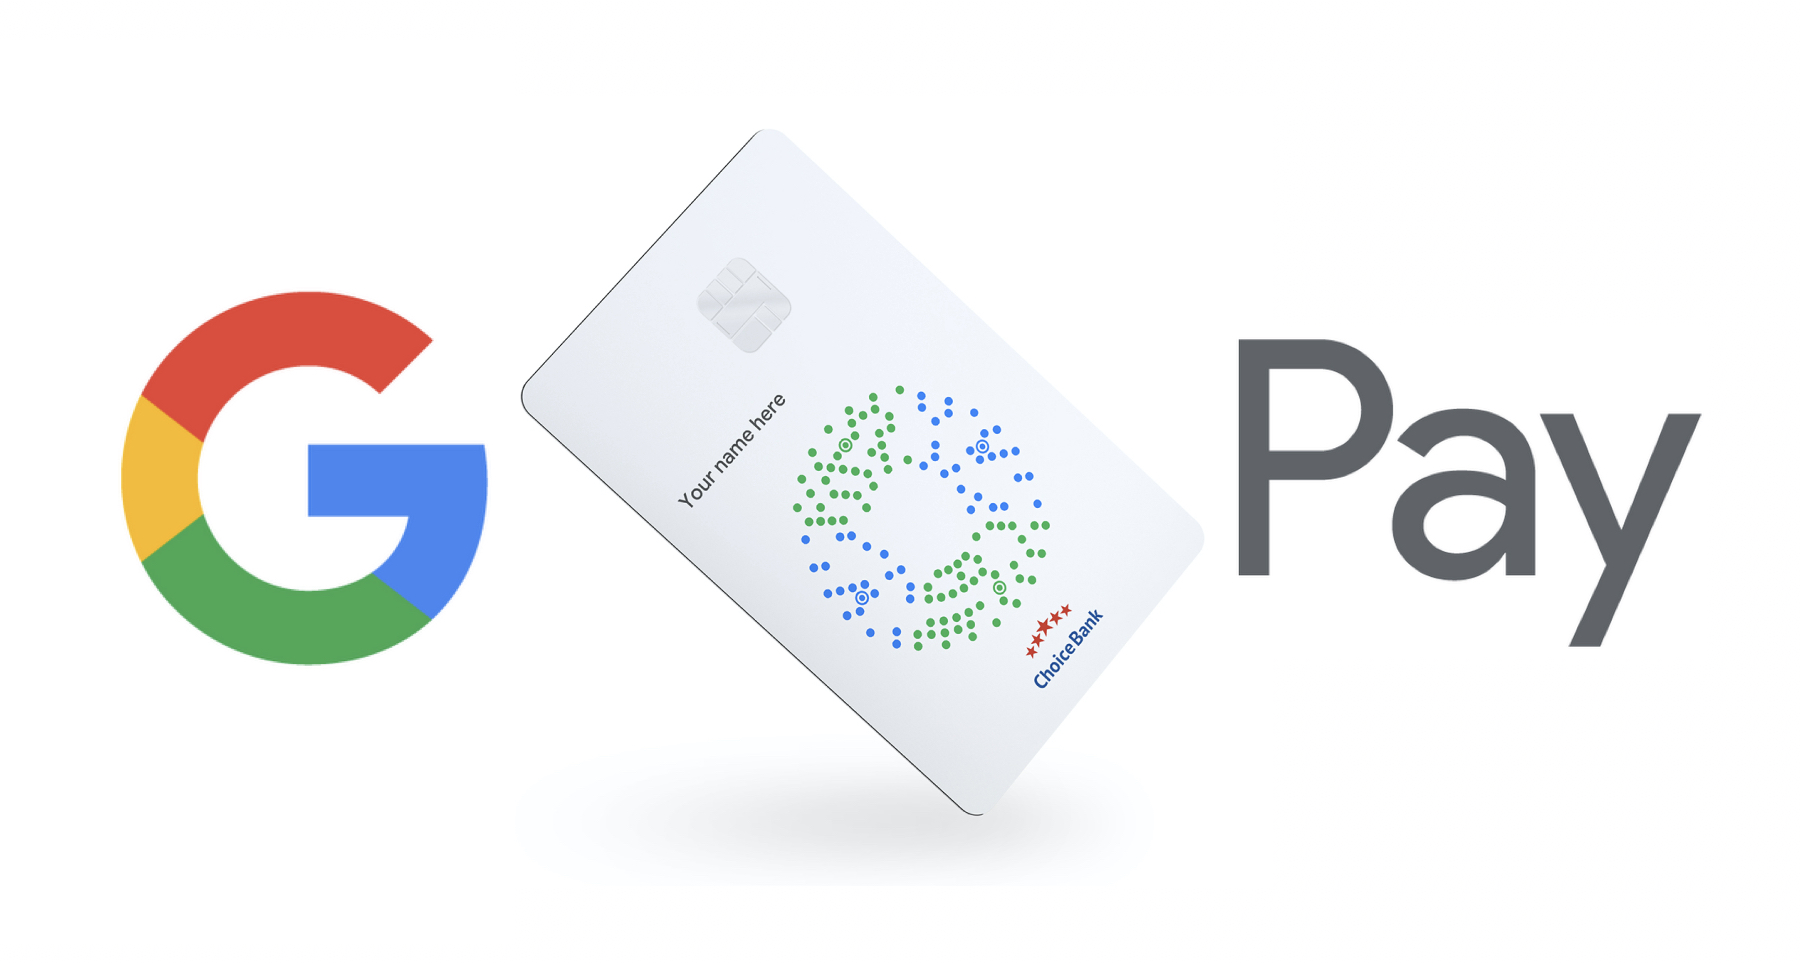 Leaked pics reveal Google smart debit card to rival Apple's | TechCrunch